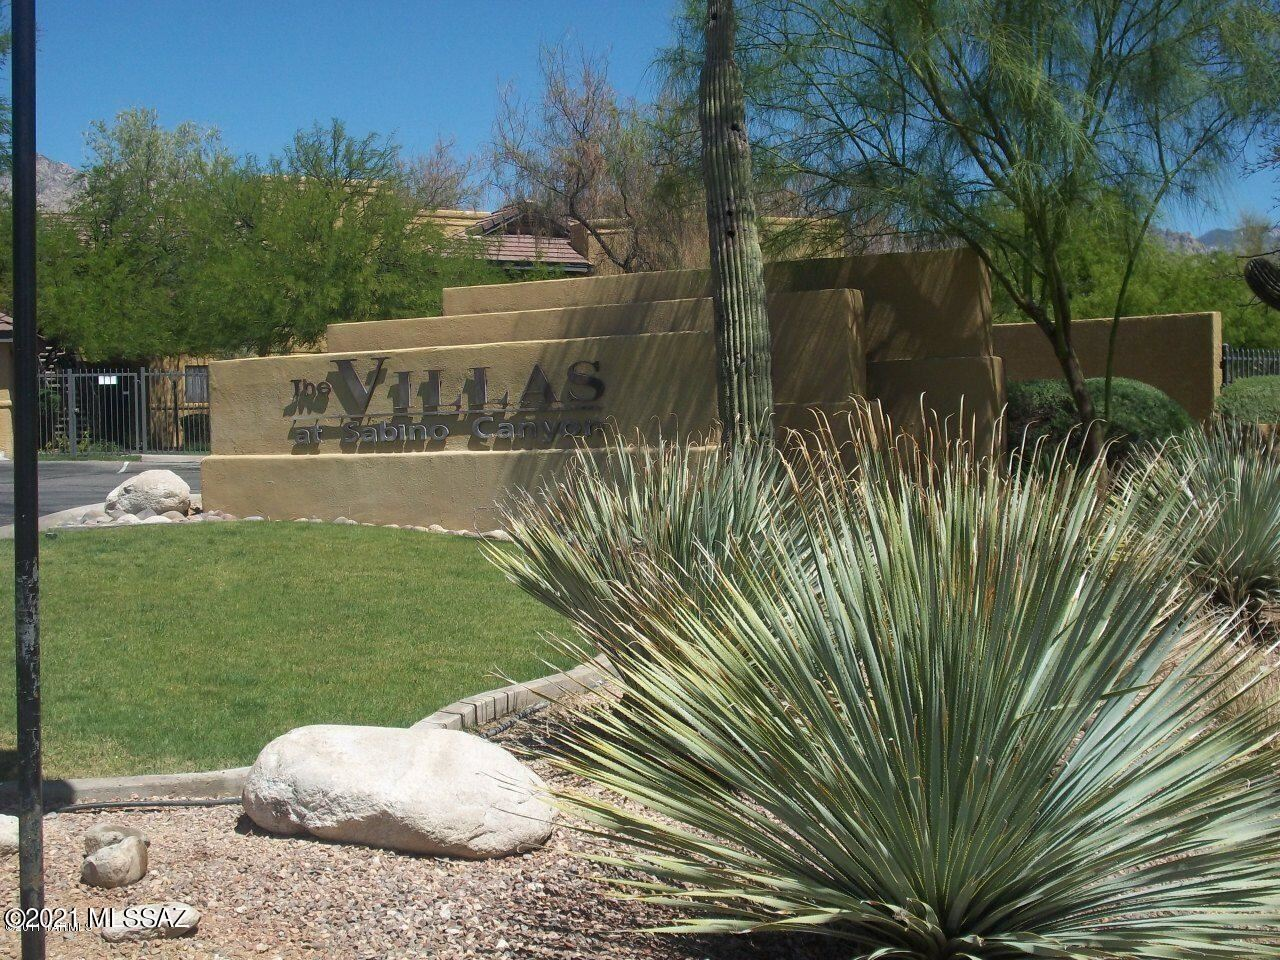 7255 E Snyder, Road #4201, Tucson, AZ 85750 - MLS#: 22124180